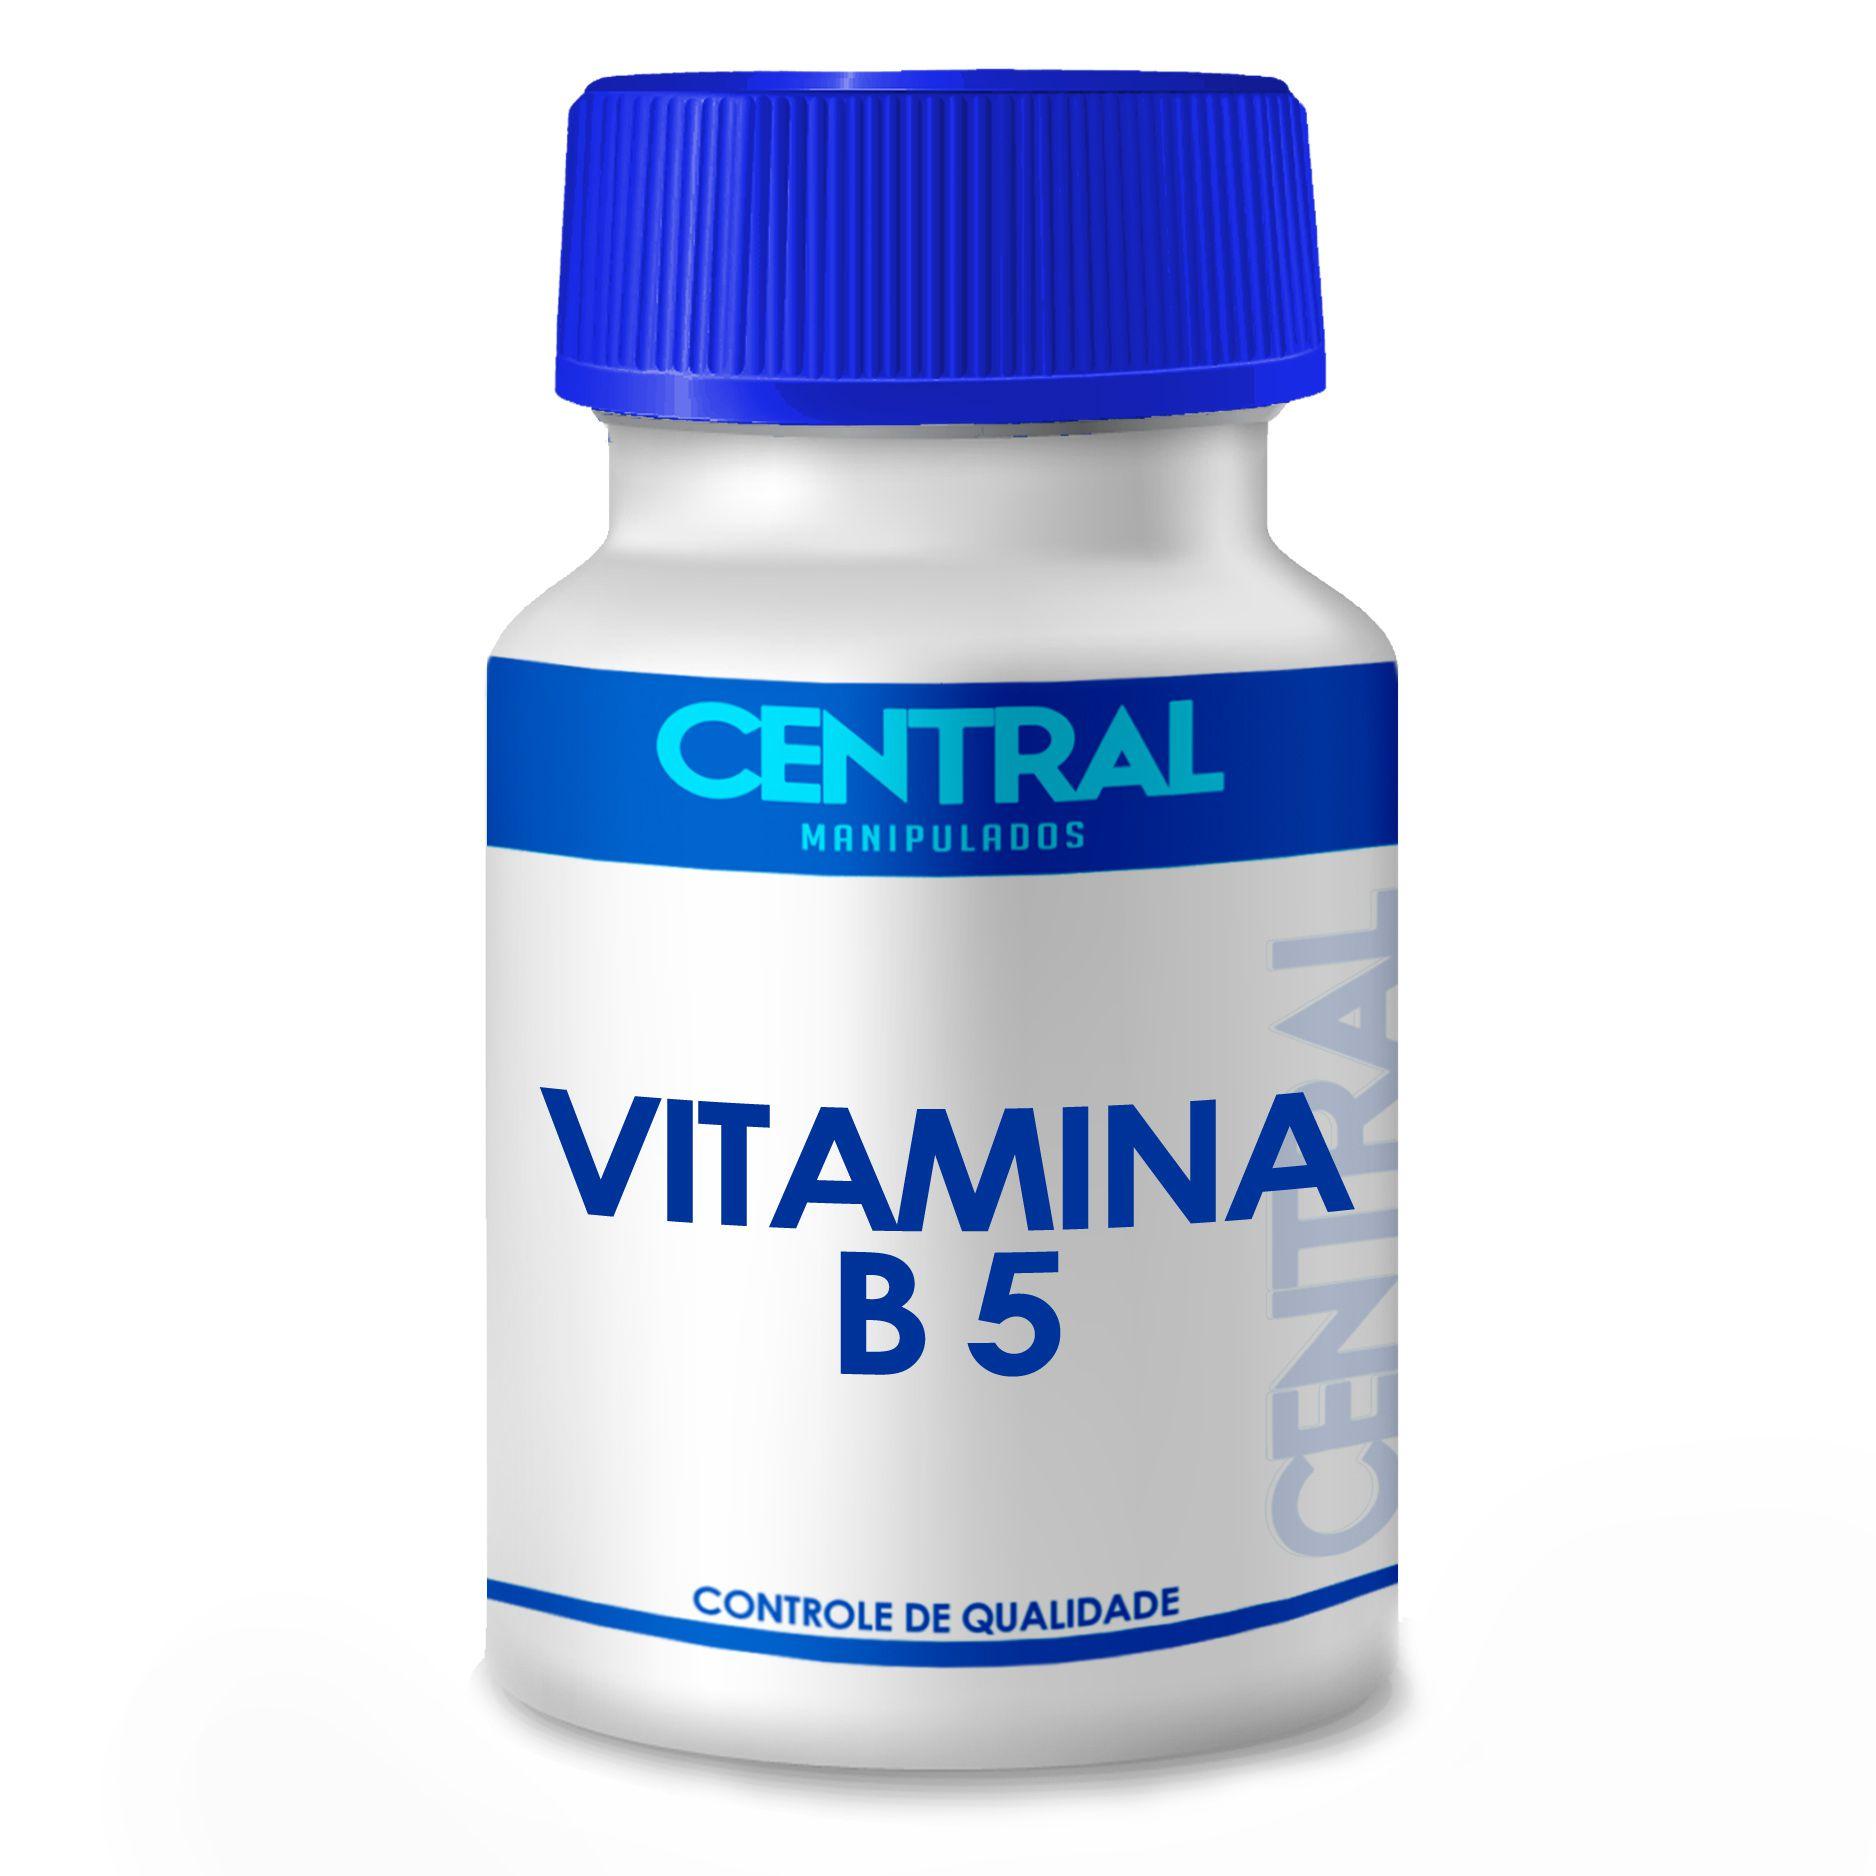 Vitamina B5 500mg 60 cápsulas - Pantotenato de Cálcio - Auxiliar no tratamento de problemas cardíacos, colite, problemas respiratórios e obesidade